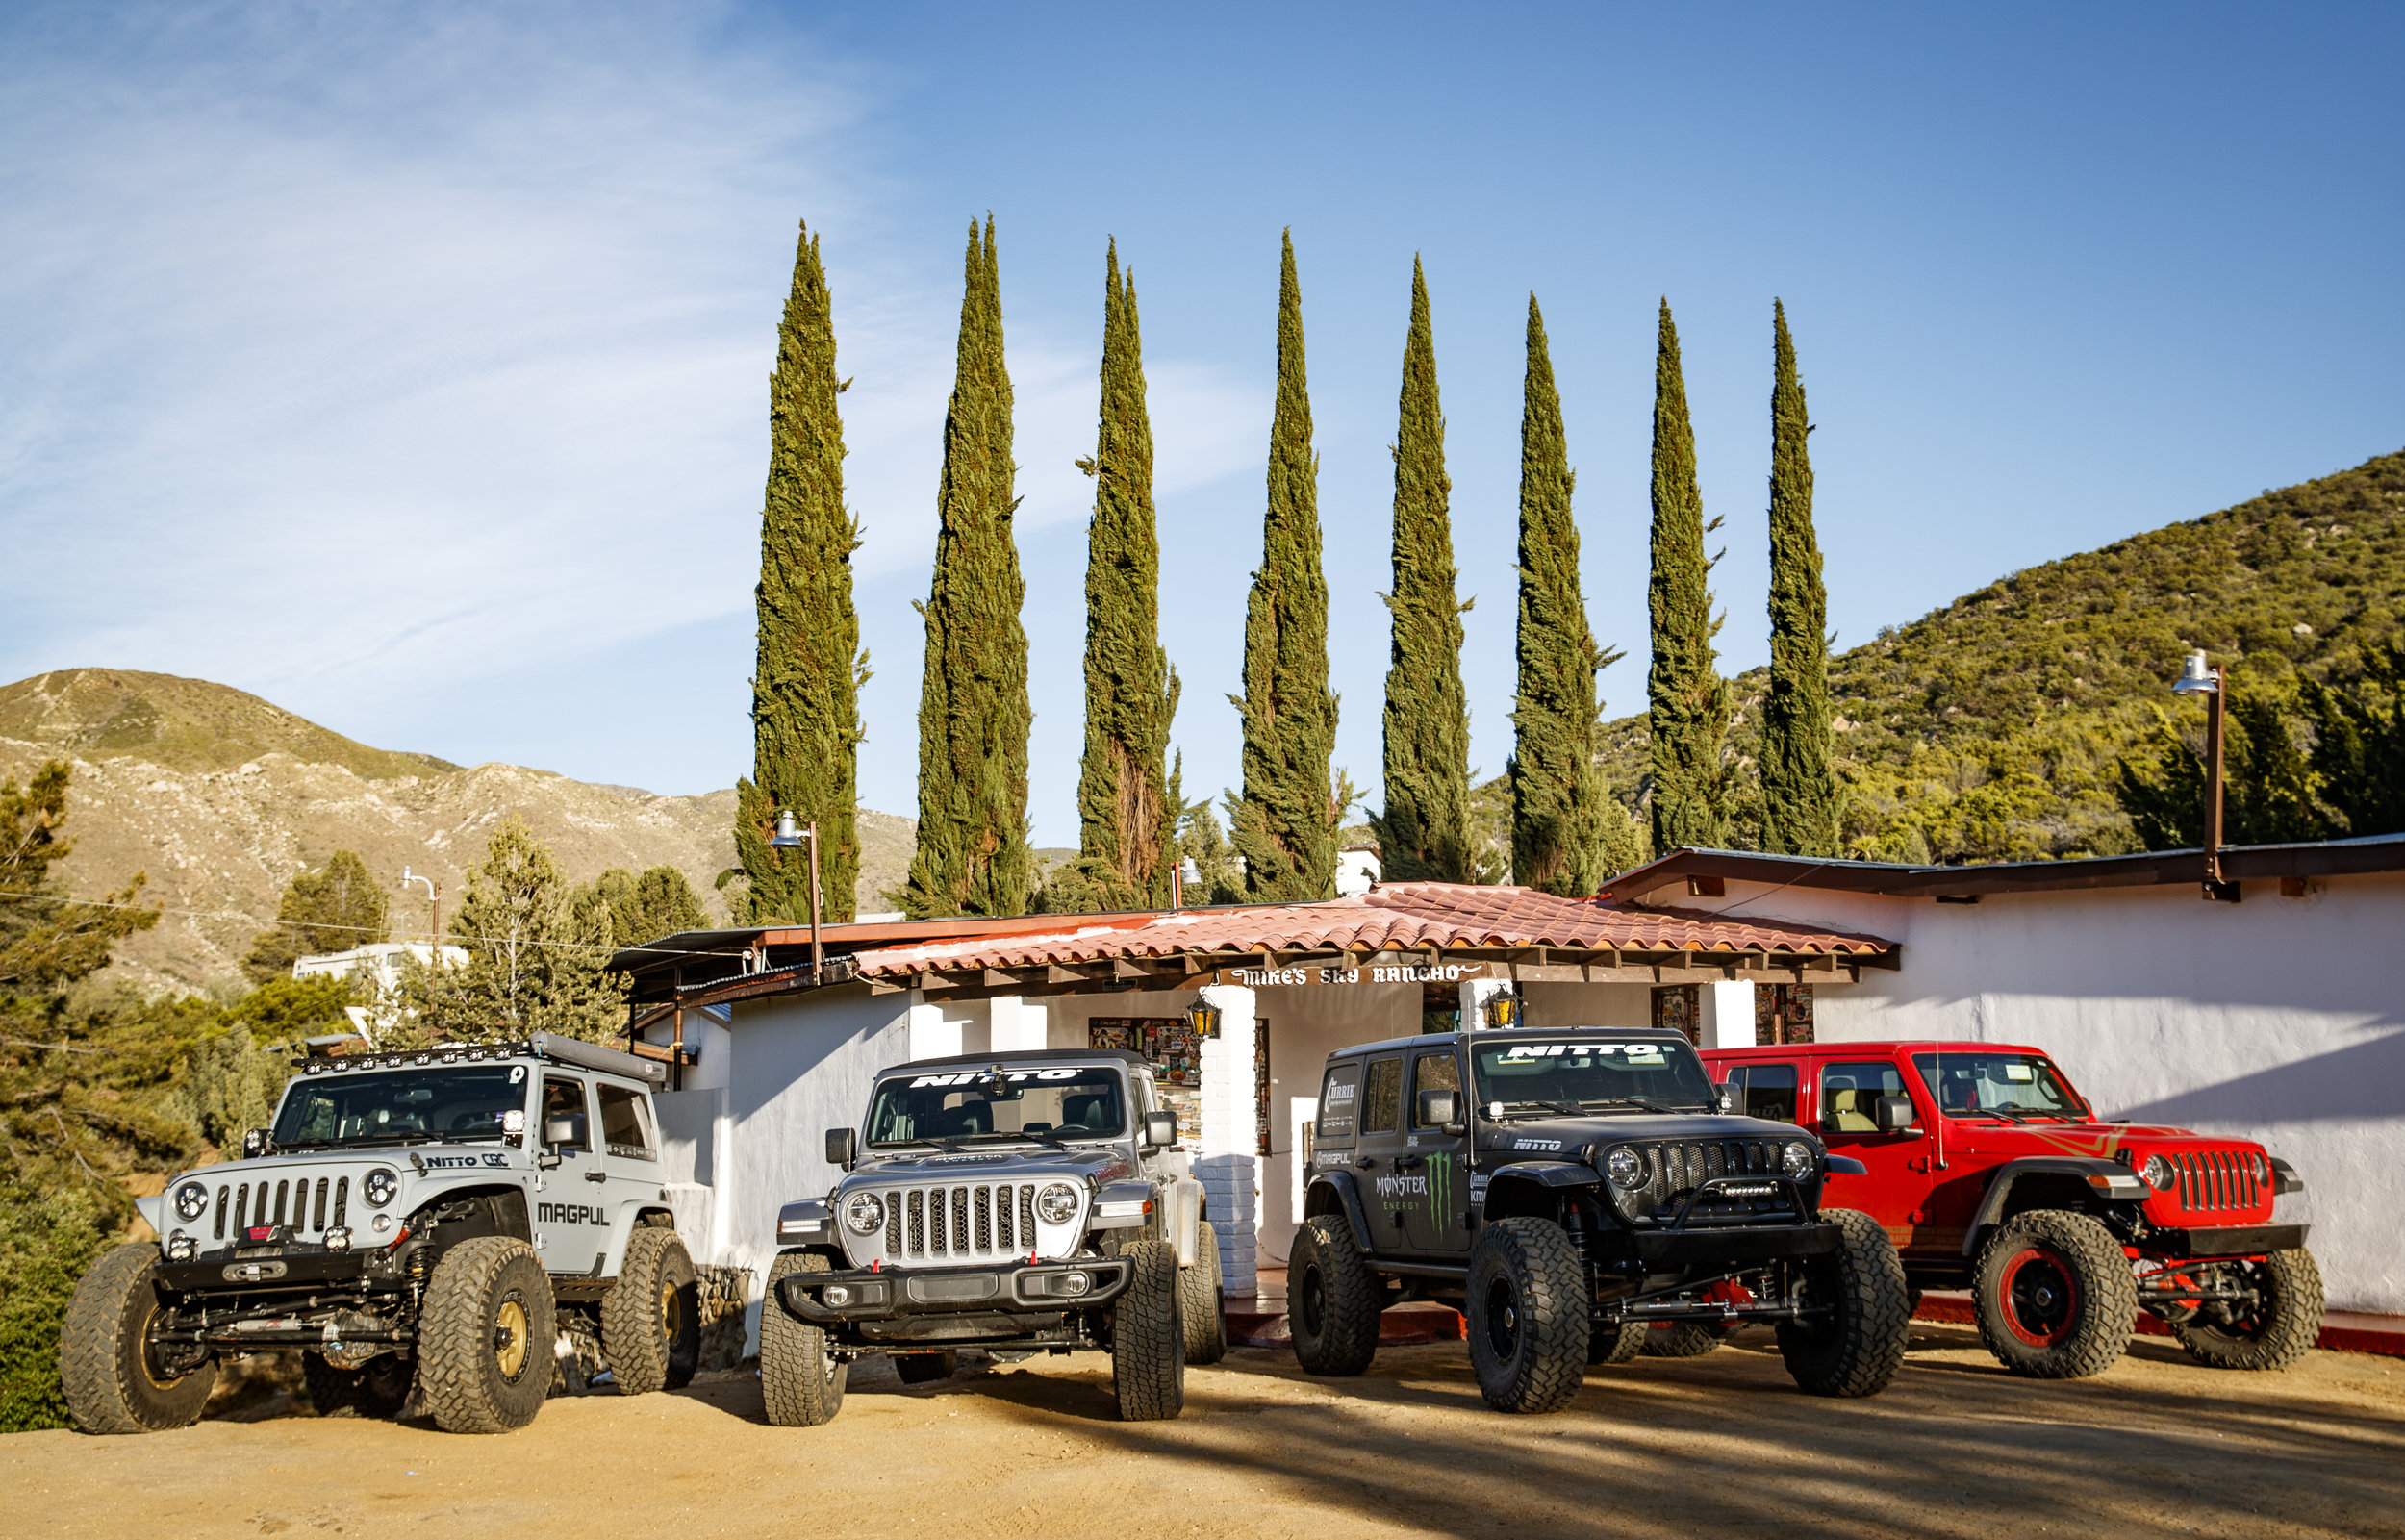 6_24_CaseyCurrie_Baja500PreRunning_BajaMexico_Jeep_005.jpg